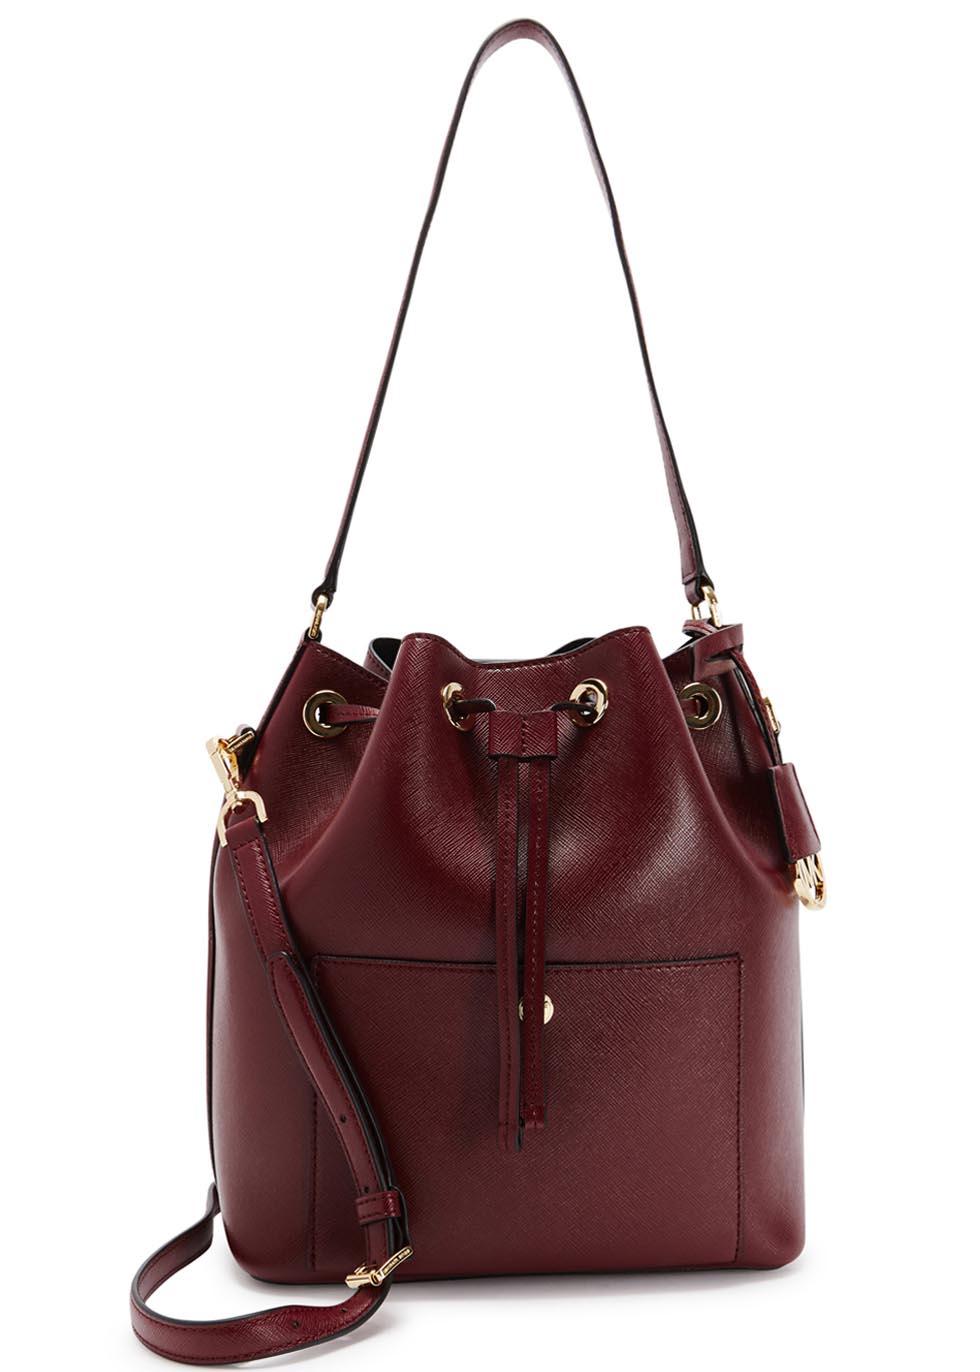 Lyst Michael Kors Greenwich Large Burgundy Leather